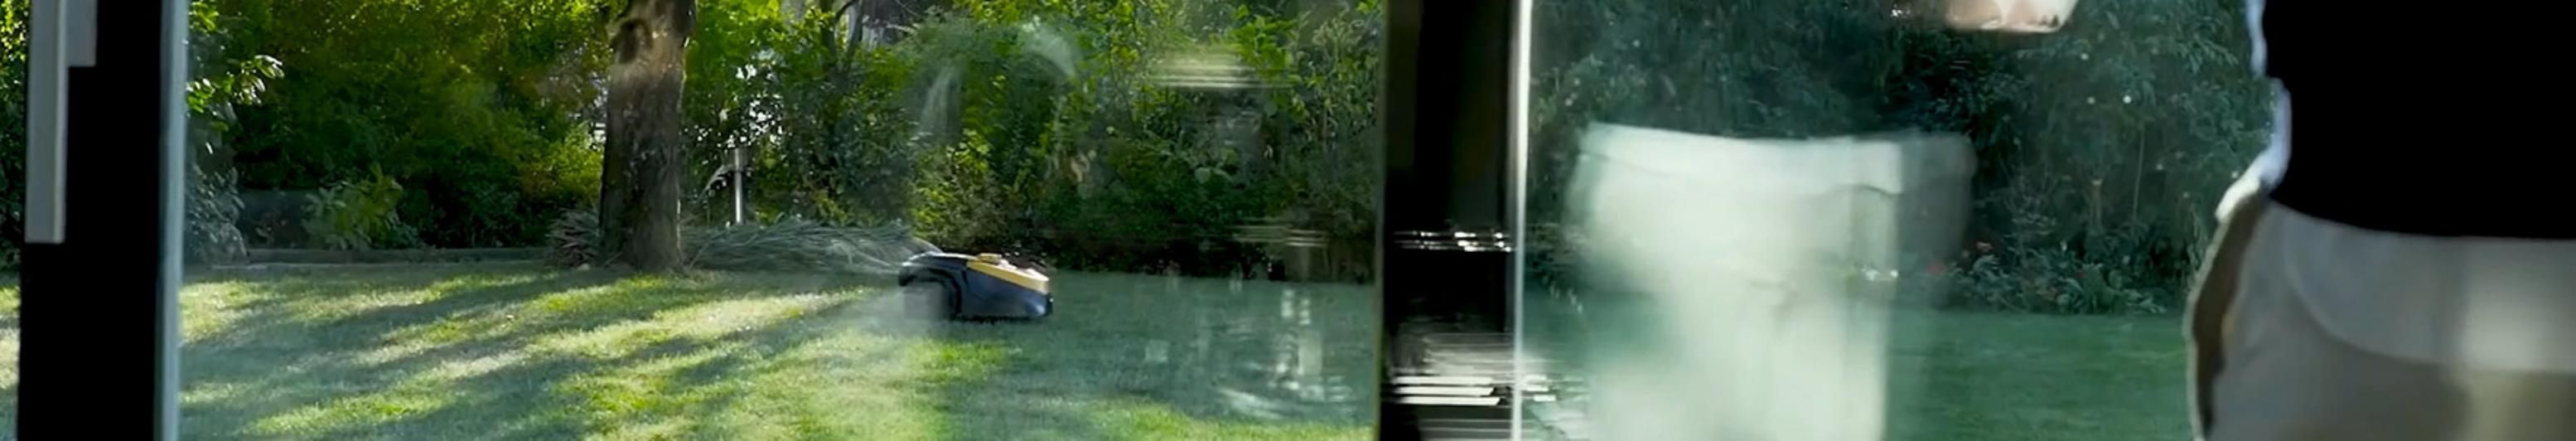 banner-robot-fromvideo_01-2x